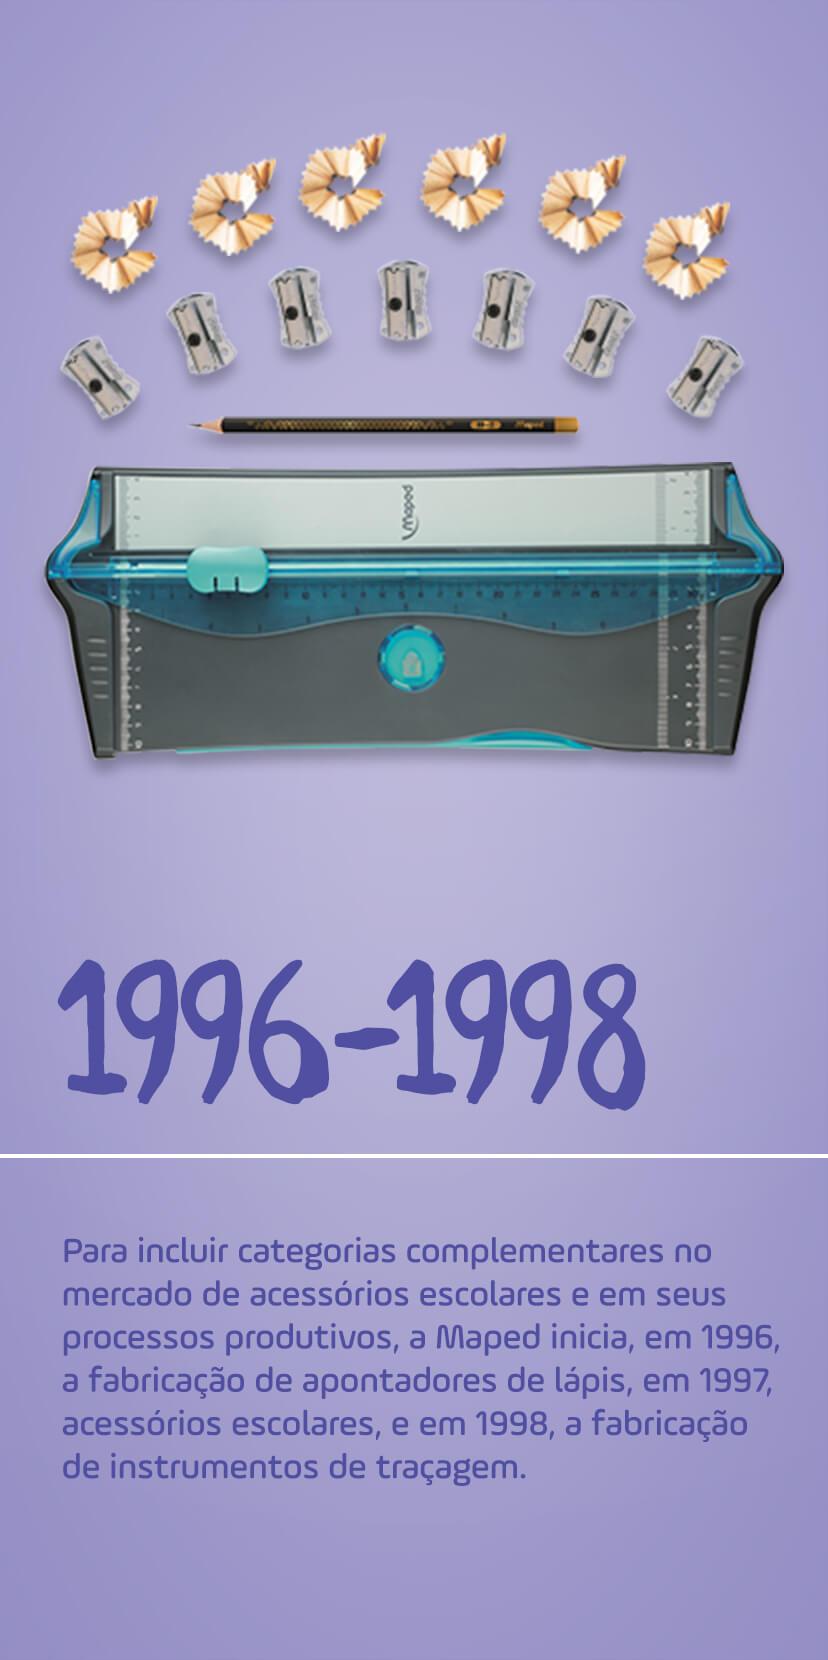 04 mobile 1996 1998